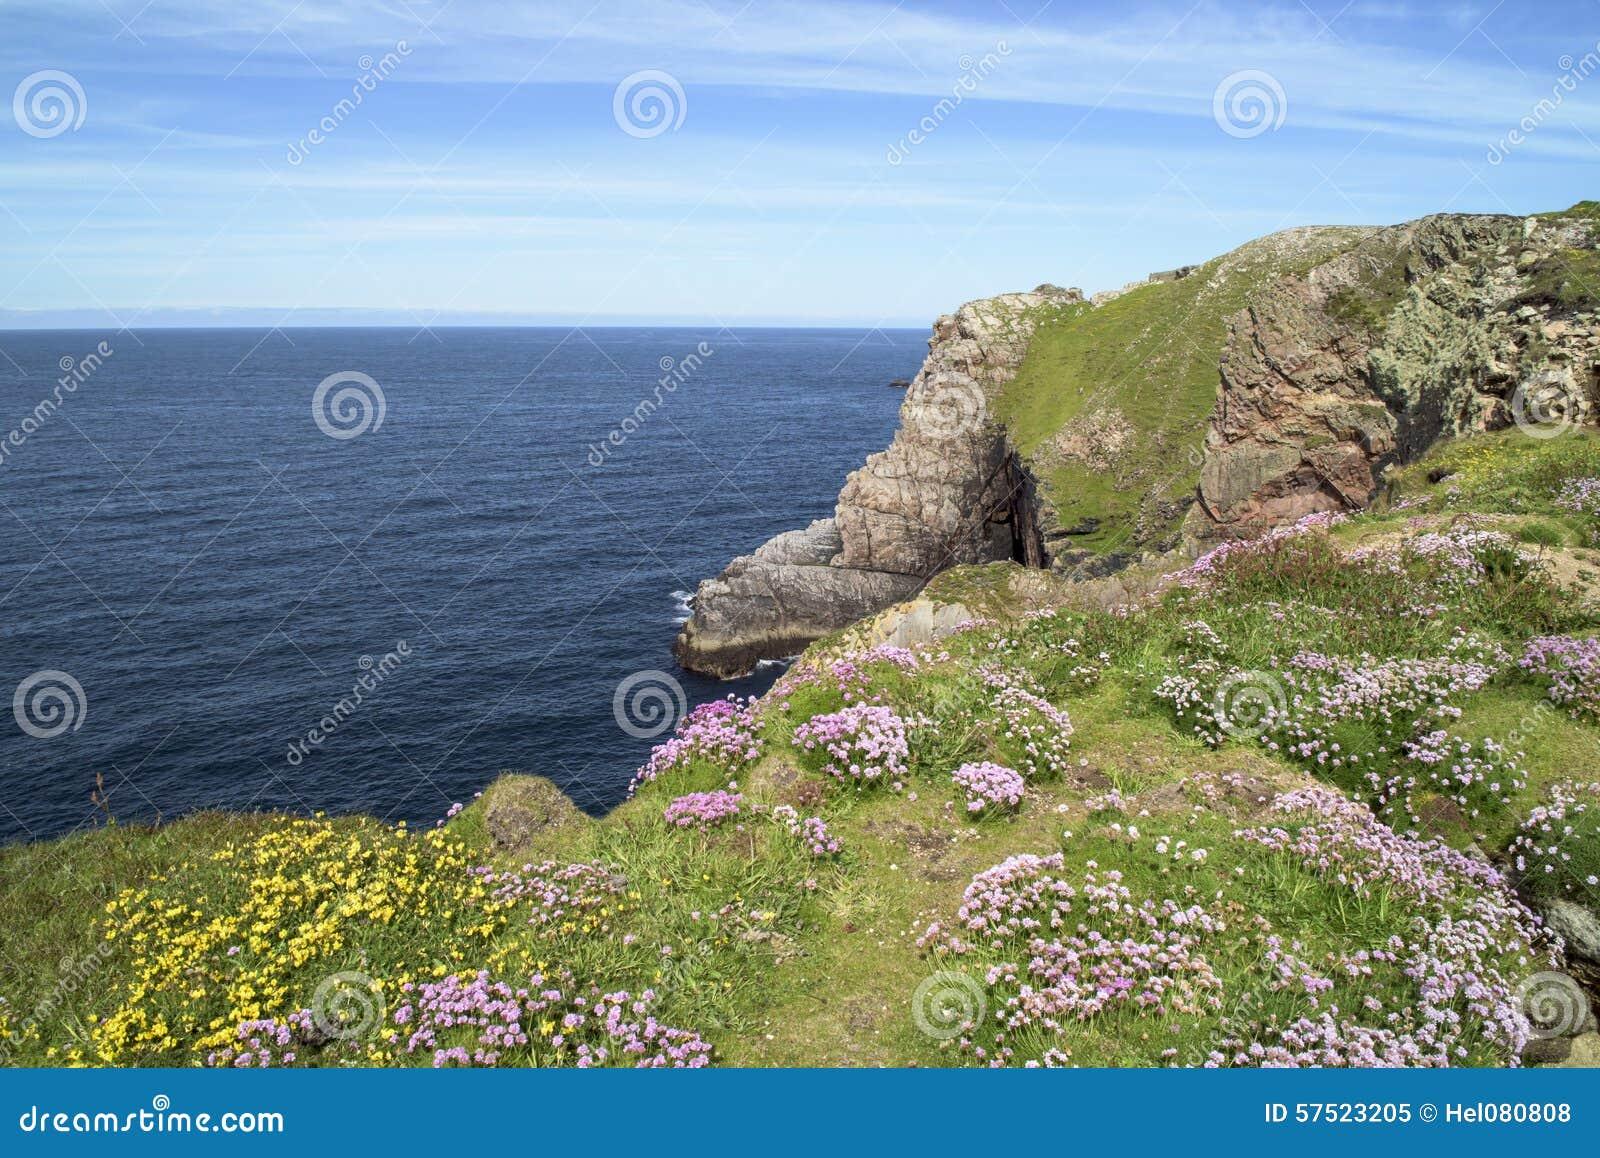 Flowers On Cliffs In Ireland Stock Image Image Of Irish Plants